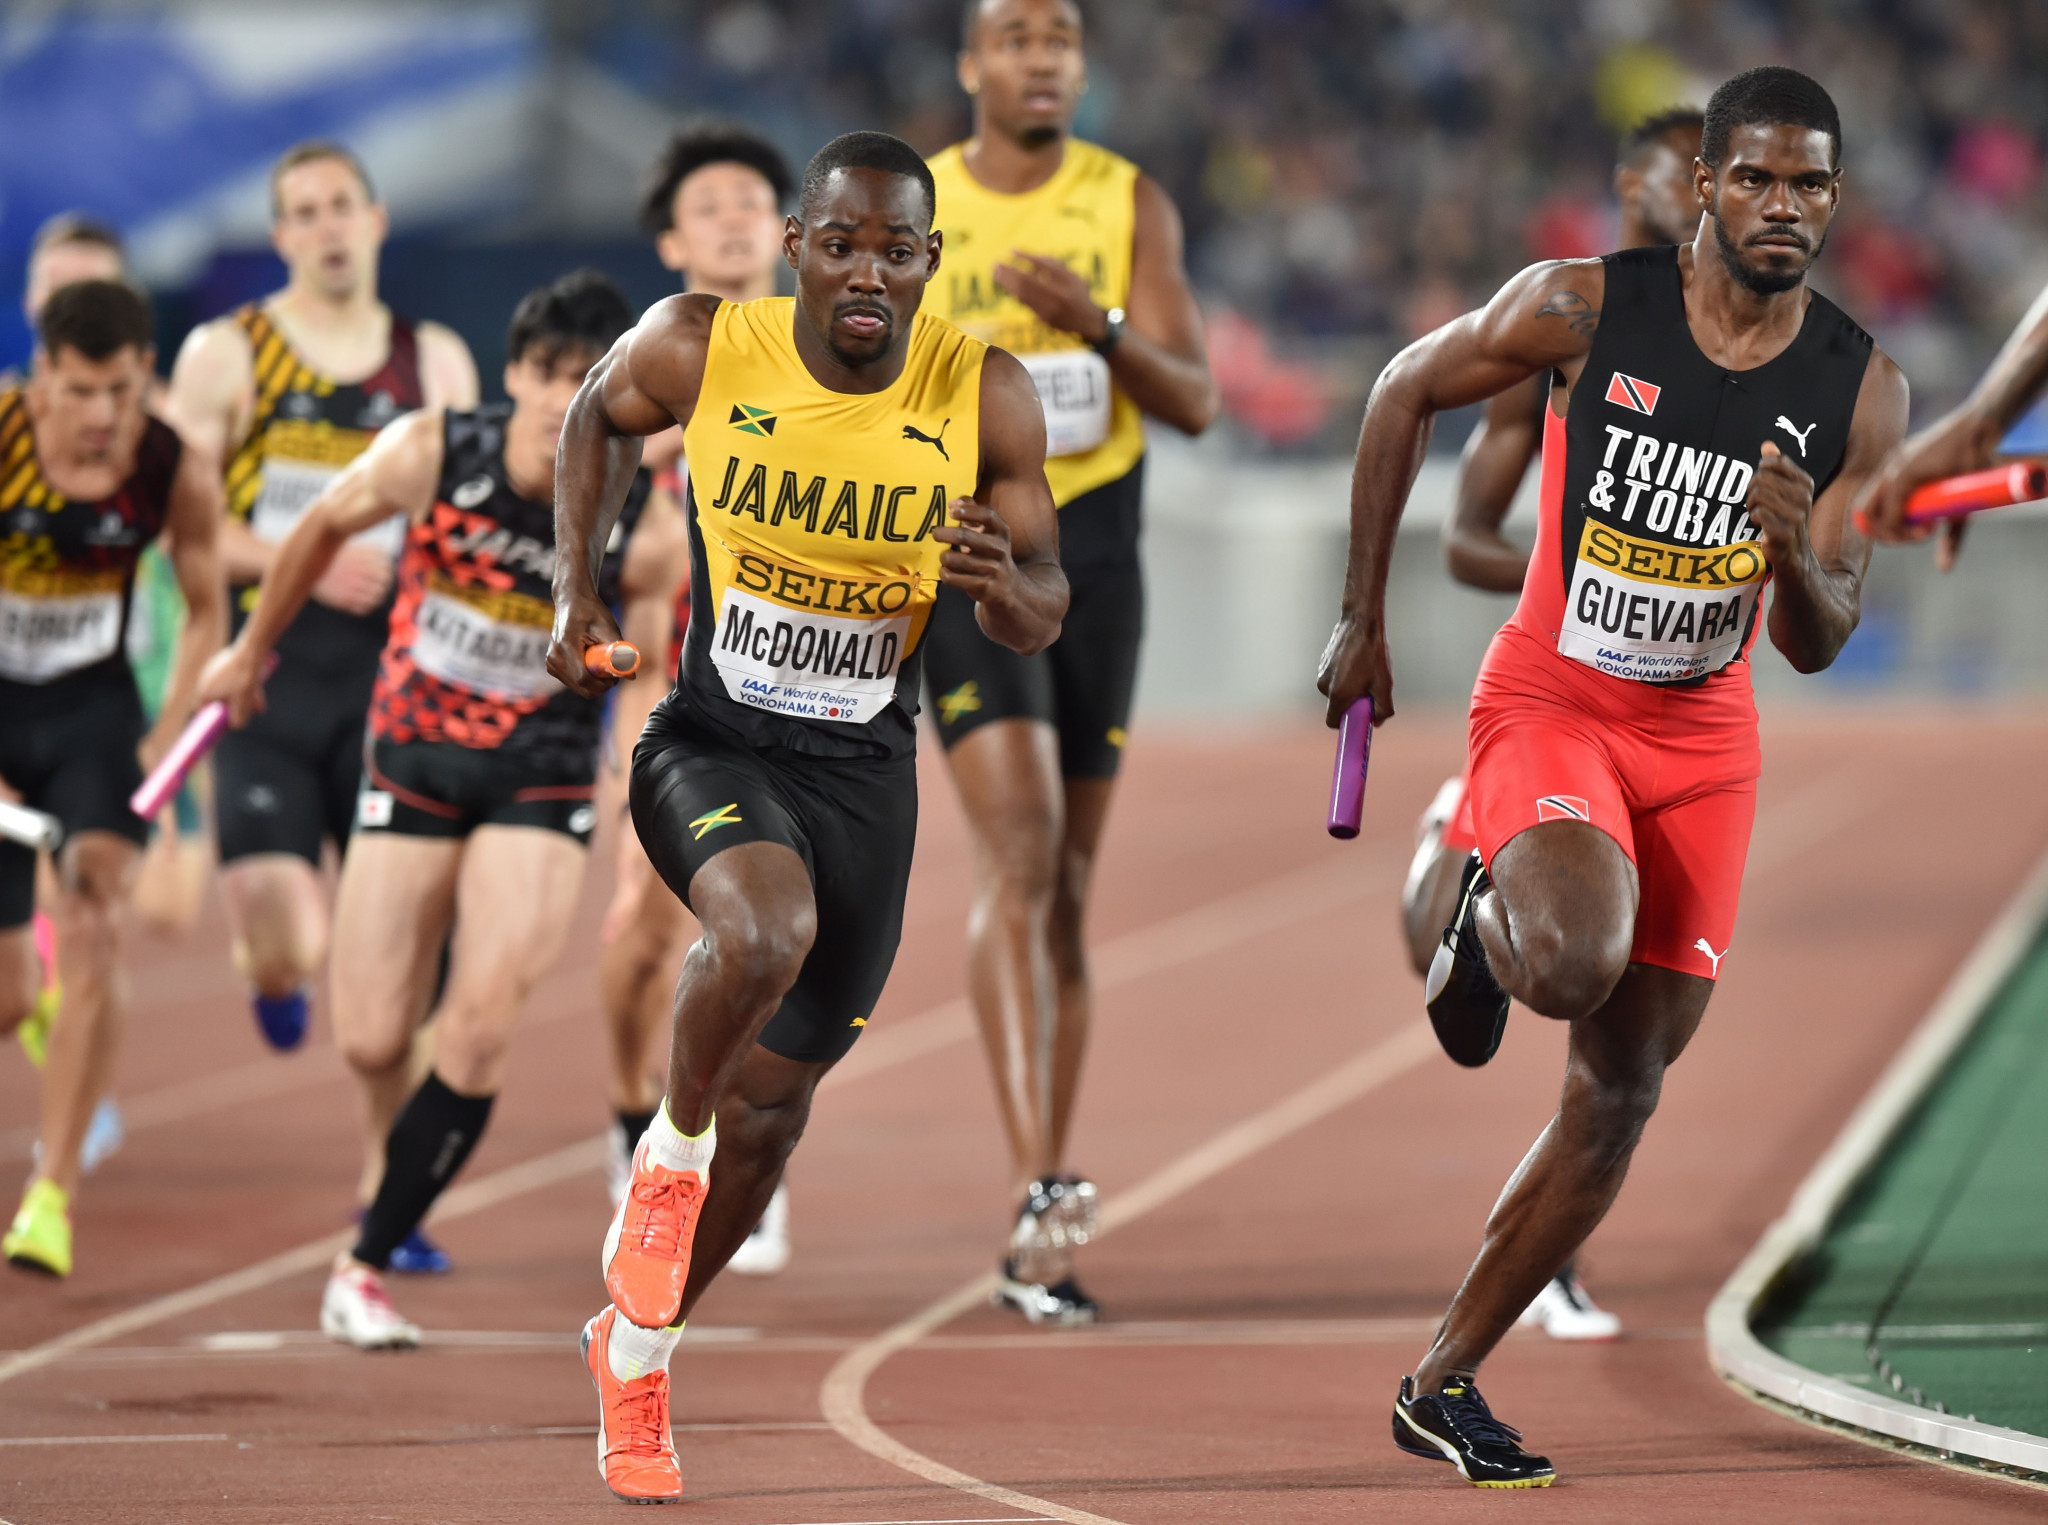 Yokohama held this year's IAAF World Relays  ©Getty Images